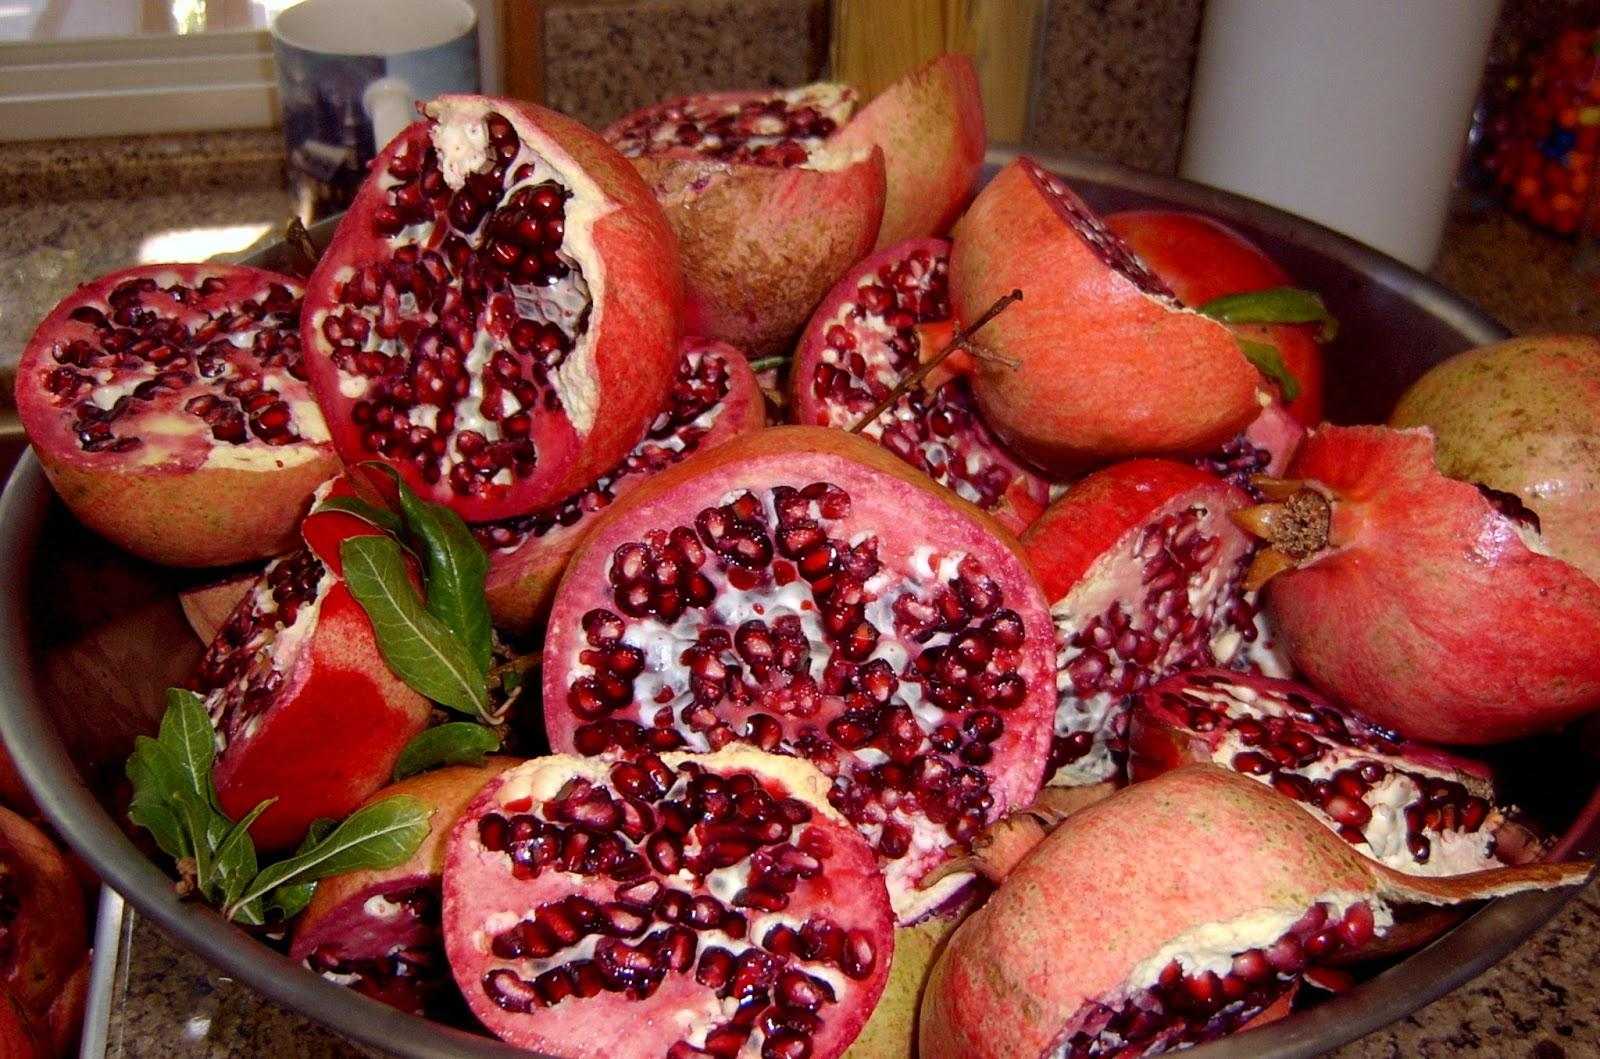 Canarella: Pomegranate Jelly/Jam